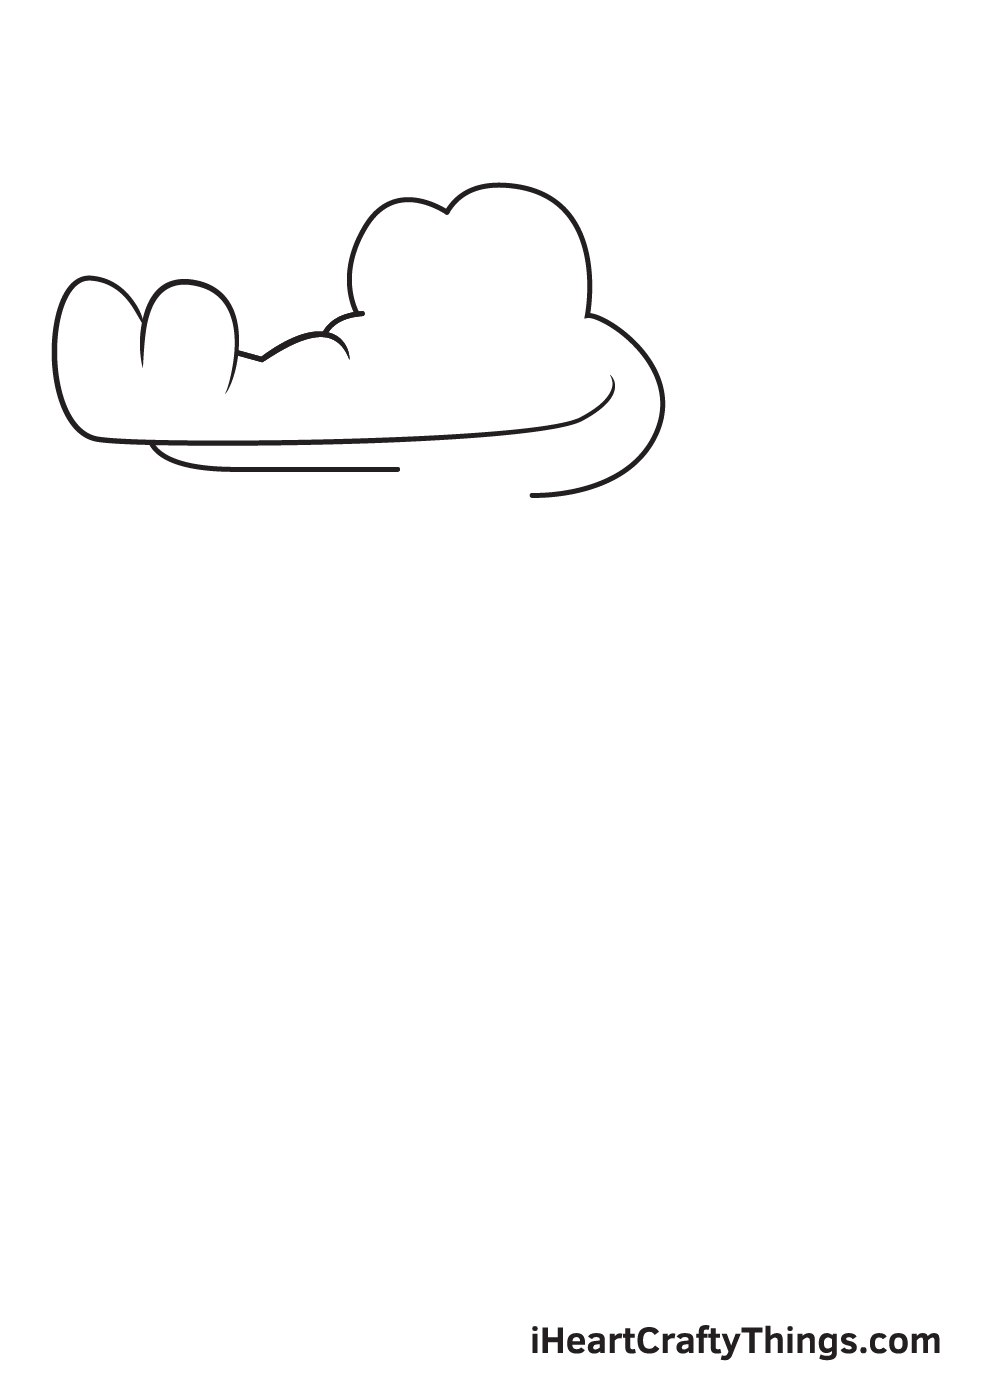 Alligator Drawing – Step 2